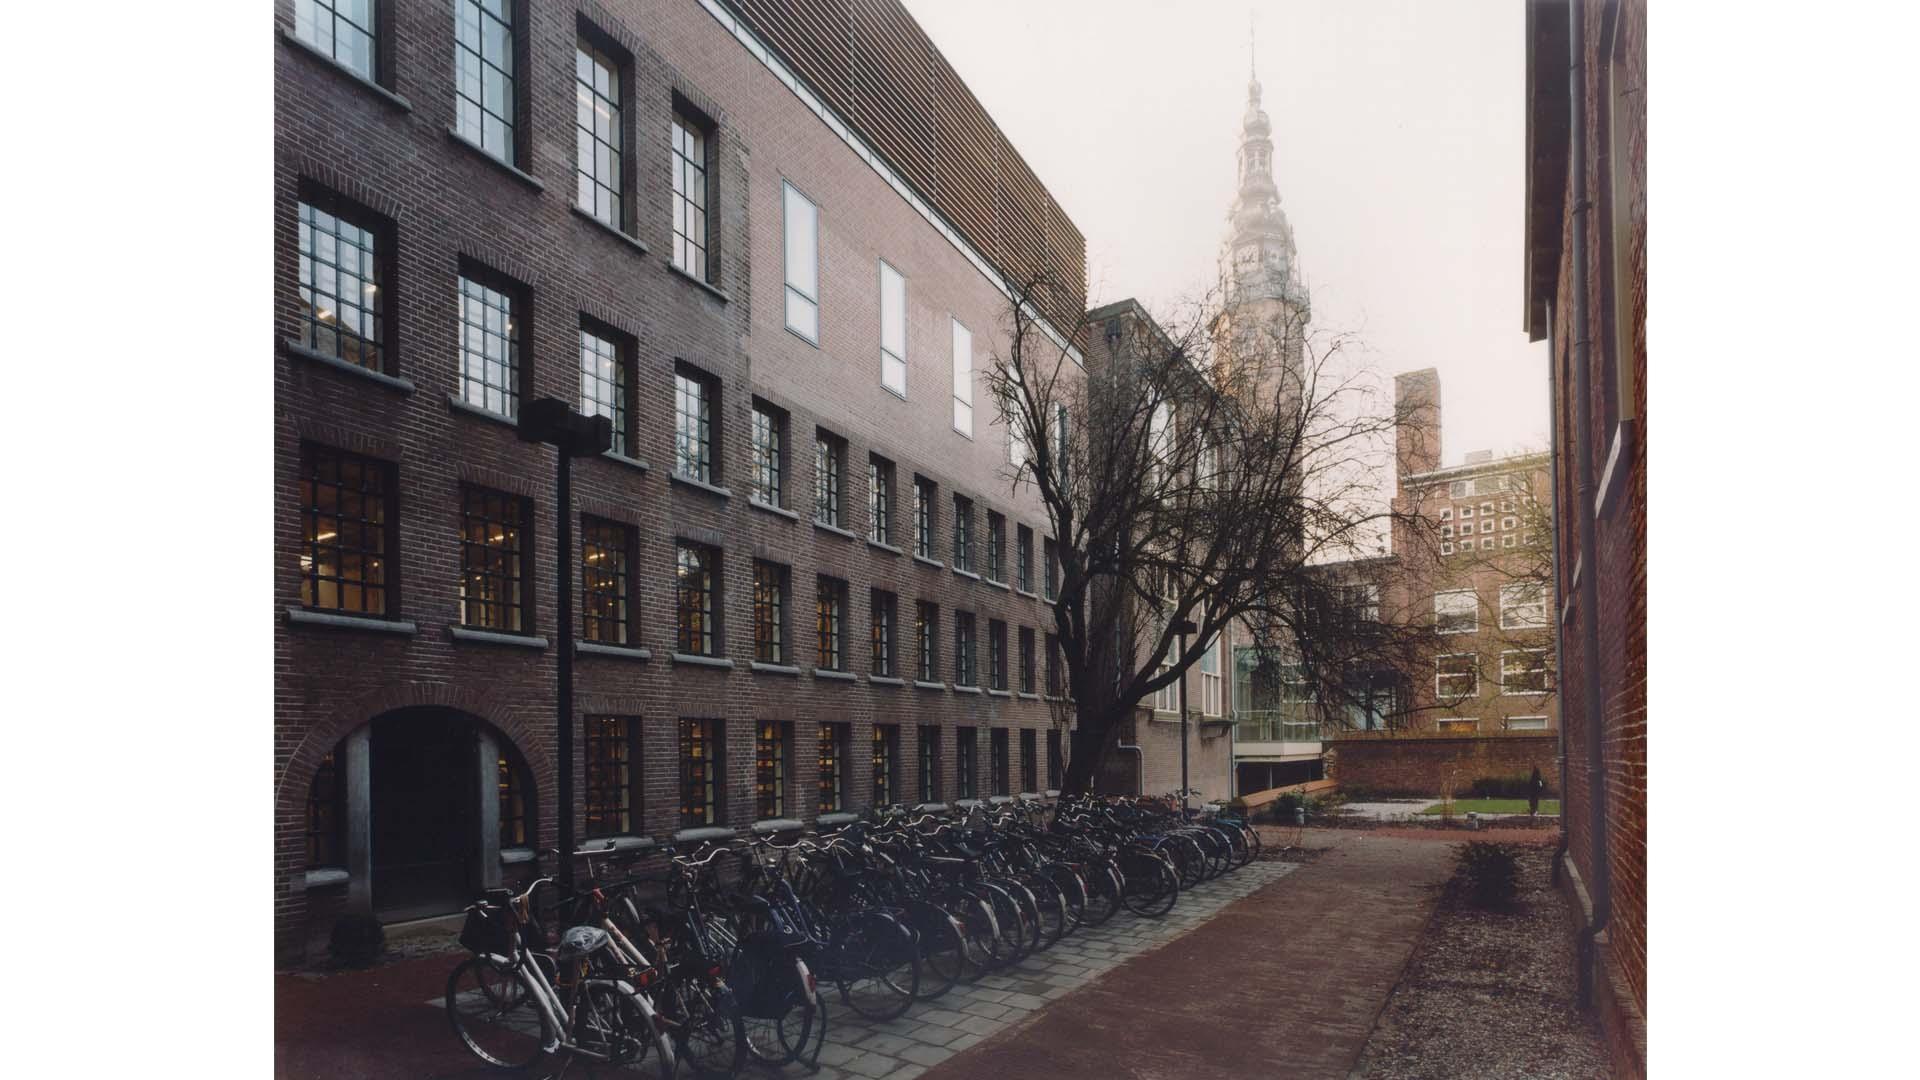 0003_Faculteit Theologie RUG Groningen_03 (2)